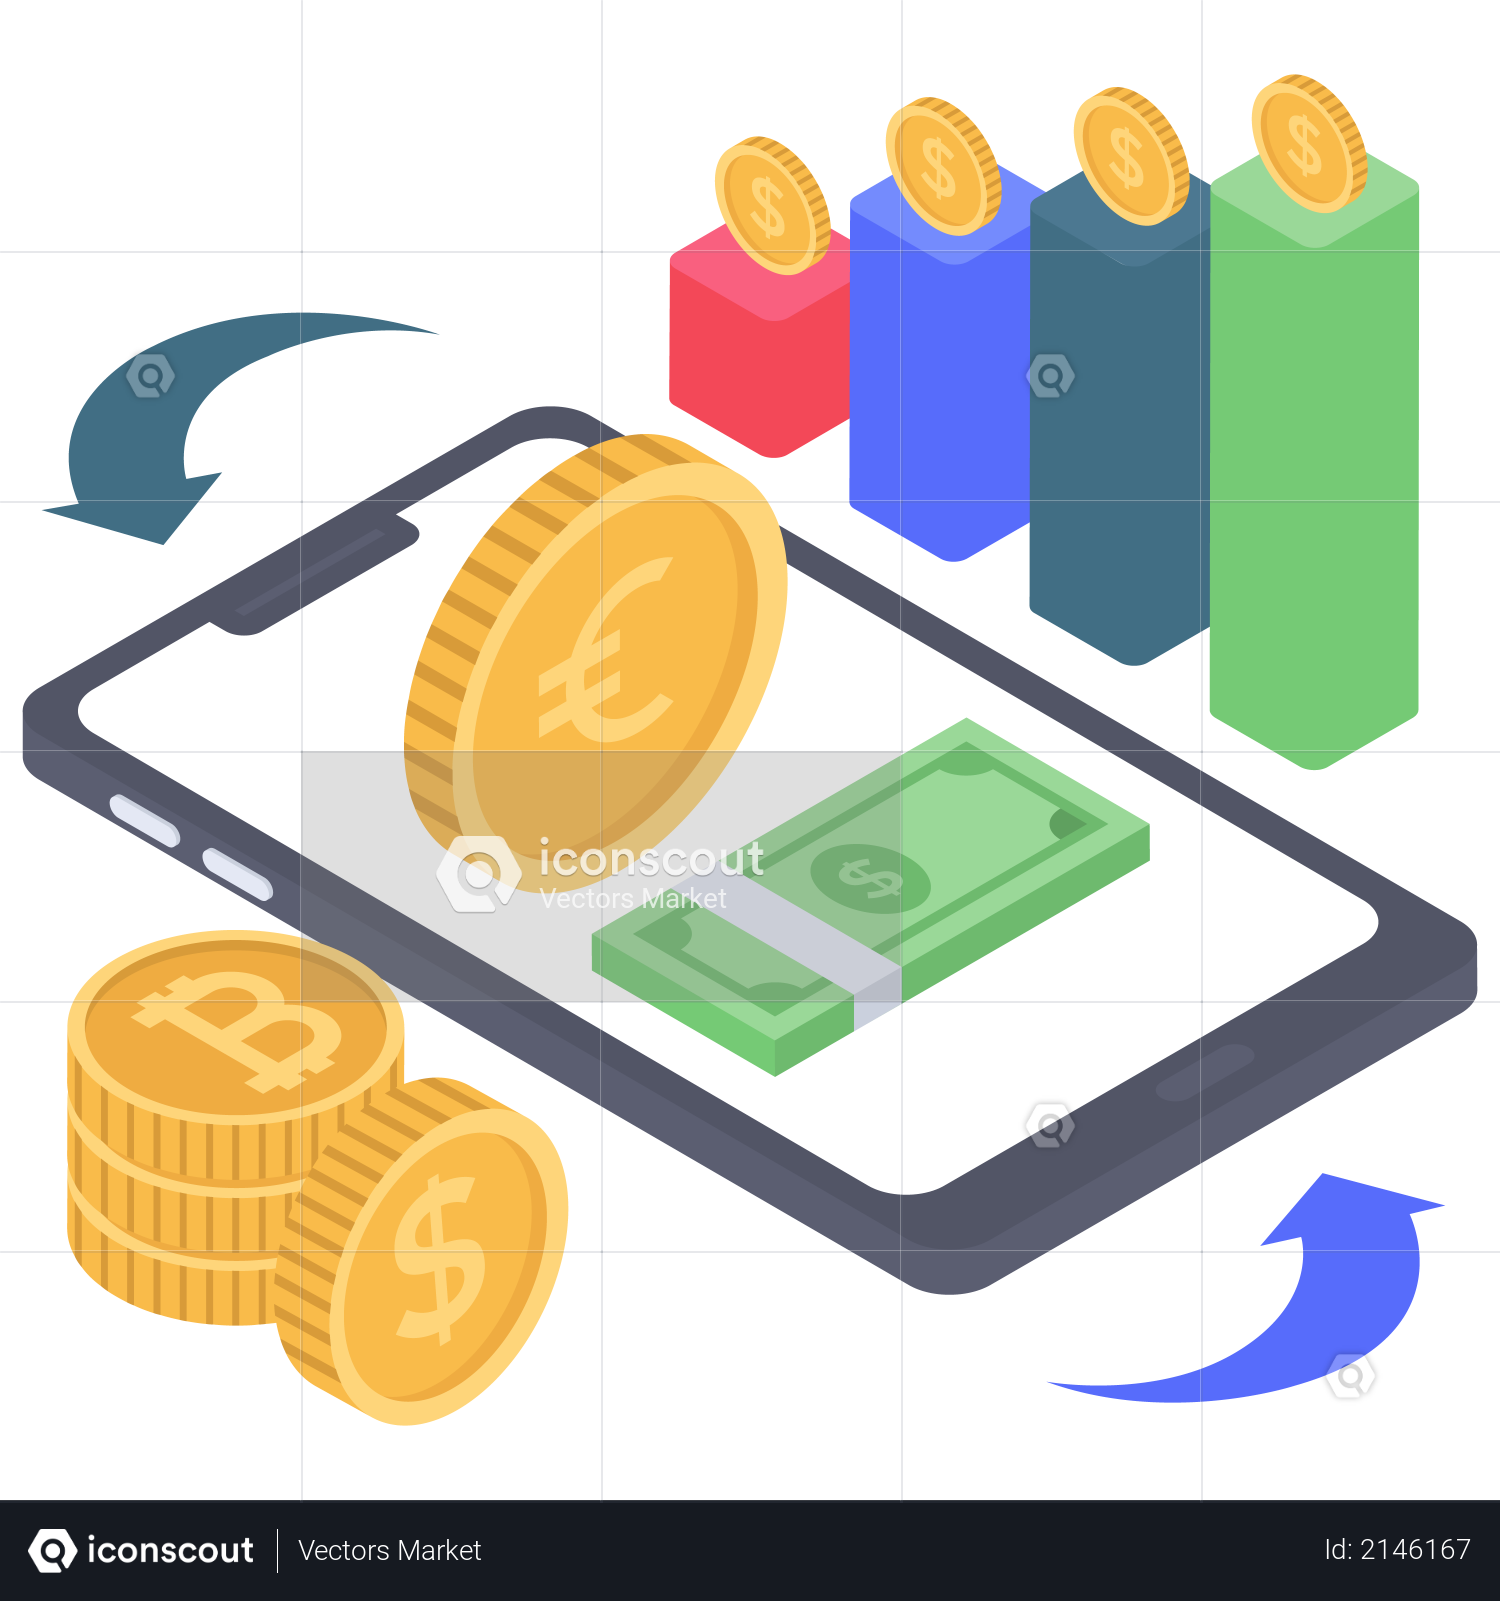 Digital Investment Growth Illustration